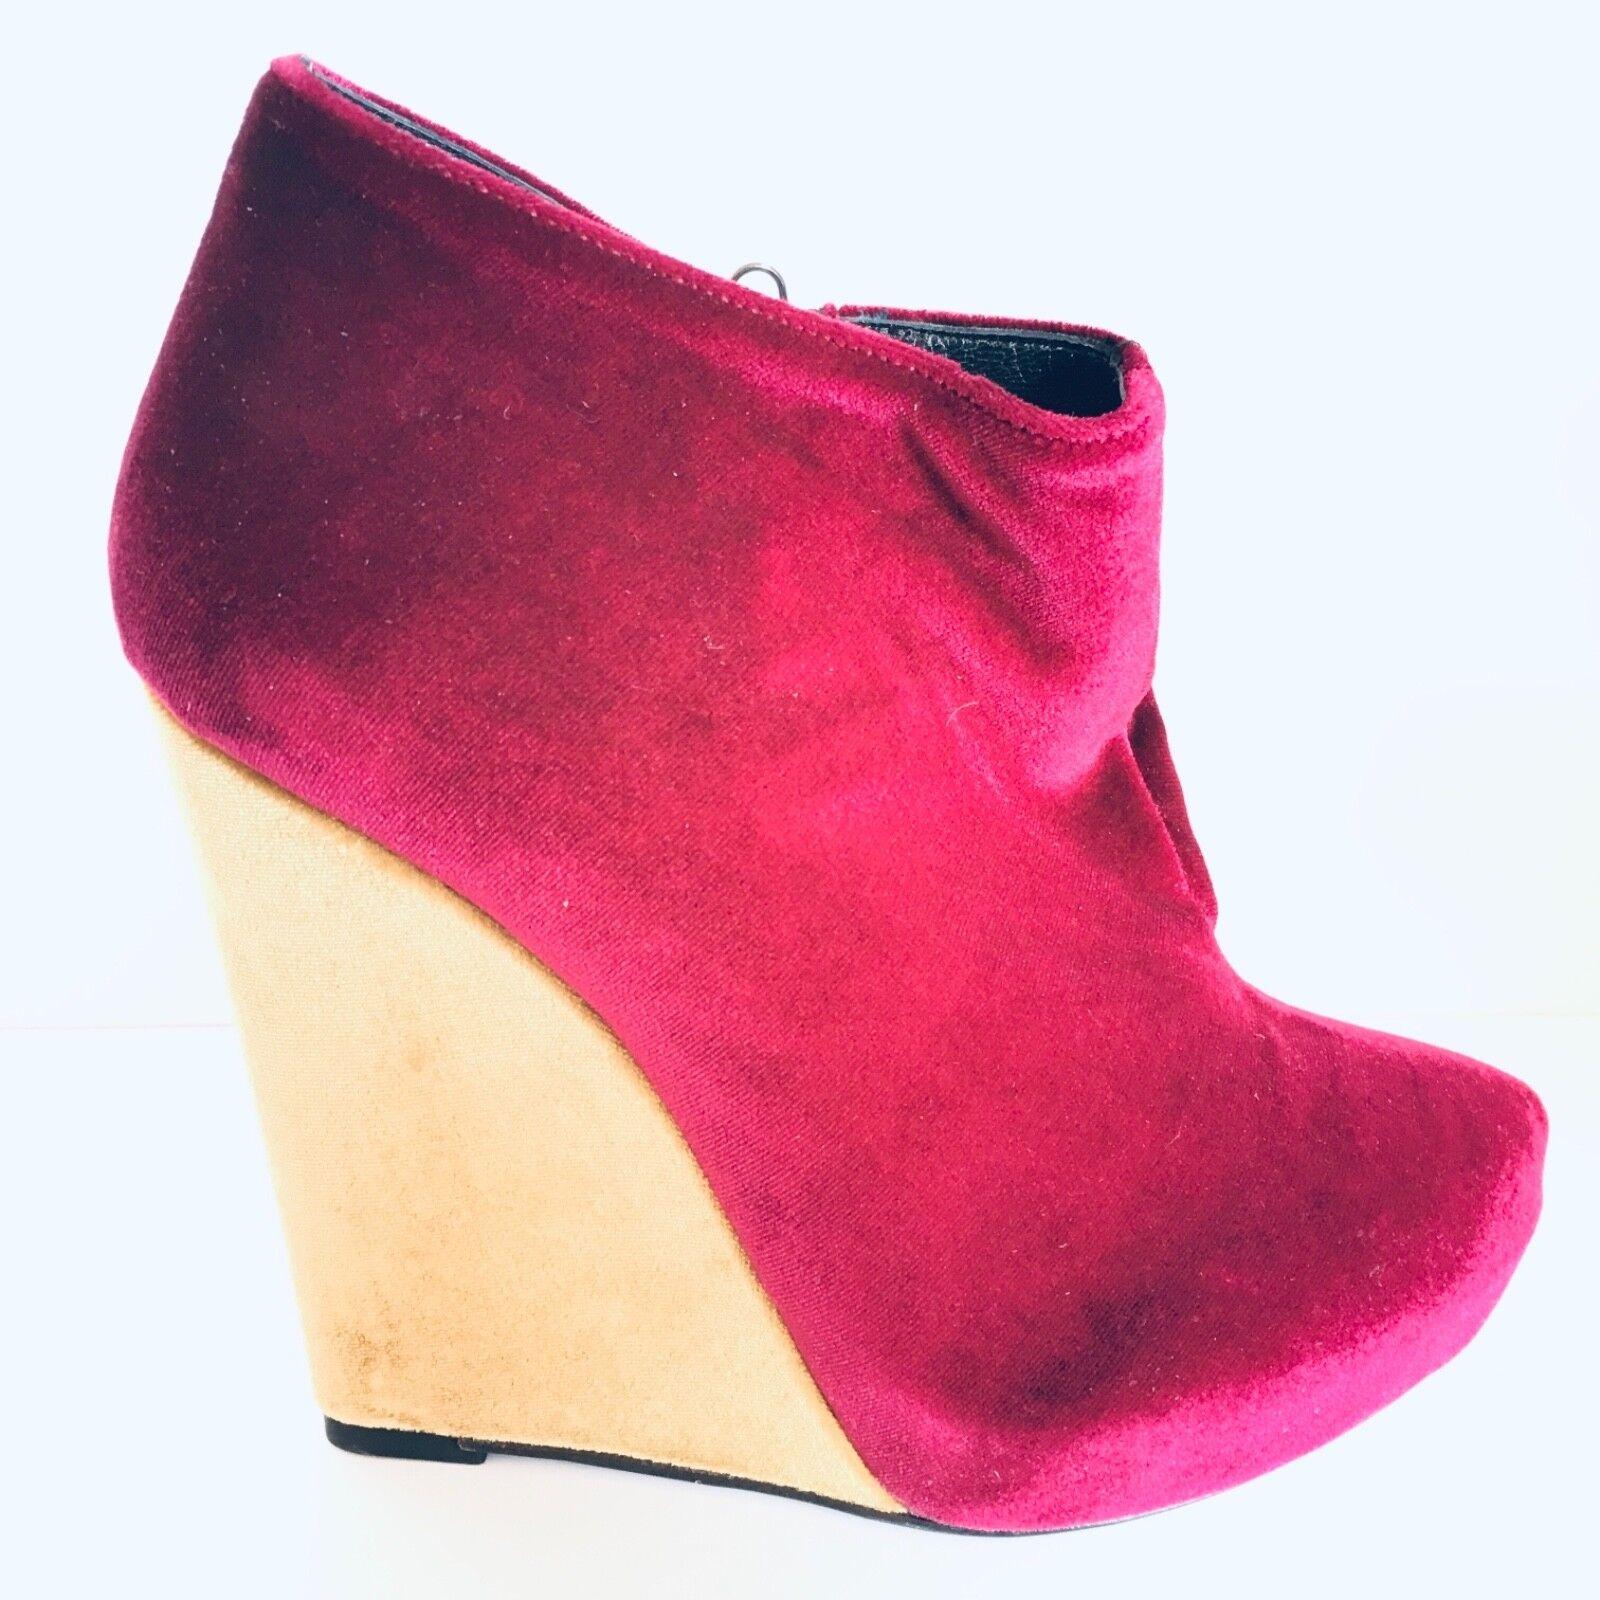 GIACOMORELLI scarpe scarpe n. 37 donna woman GIAW51 camoscio biColoreeee